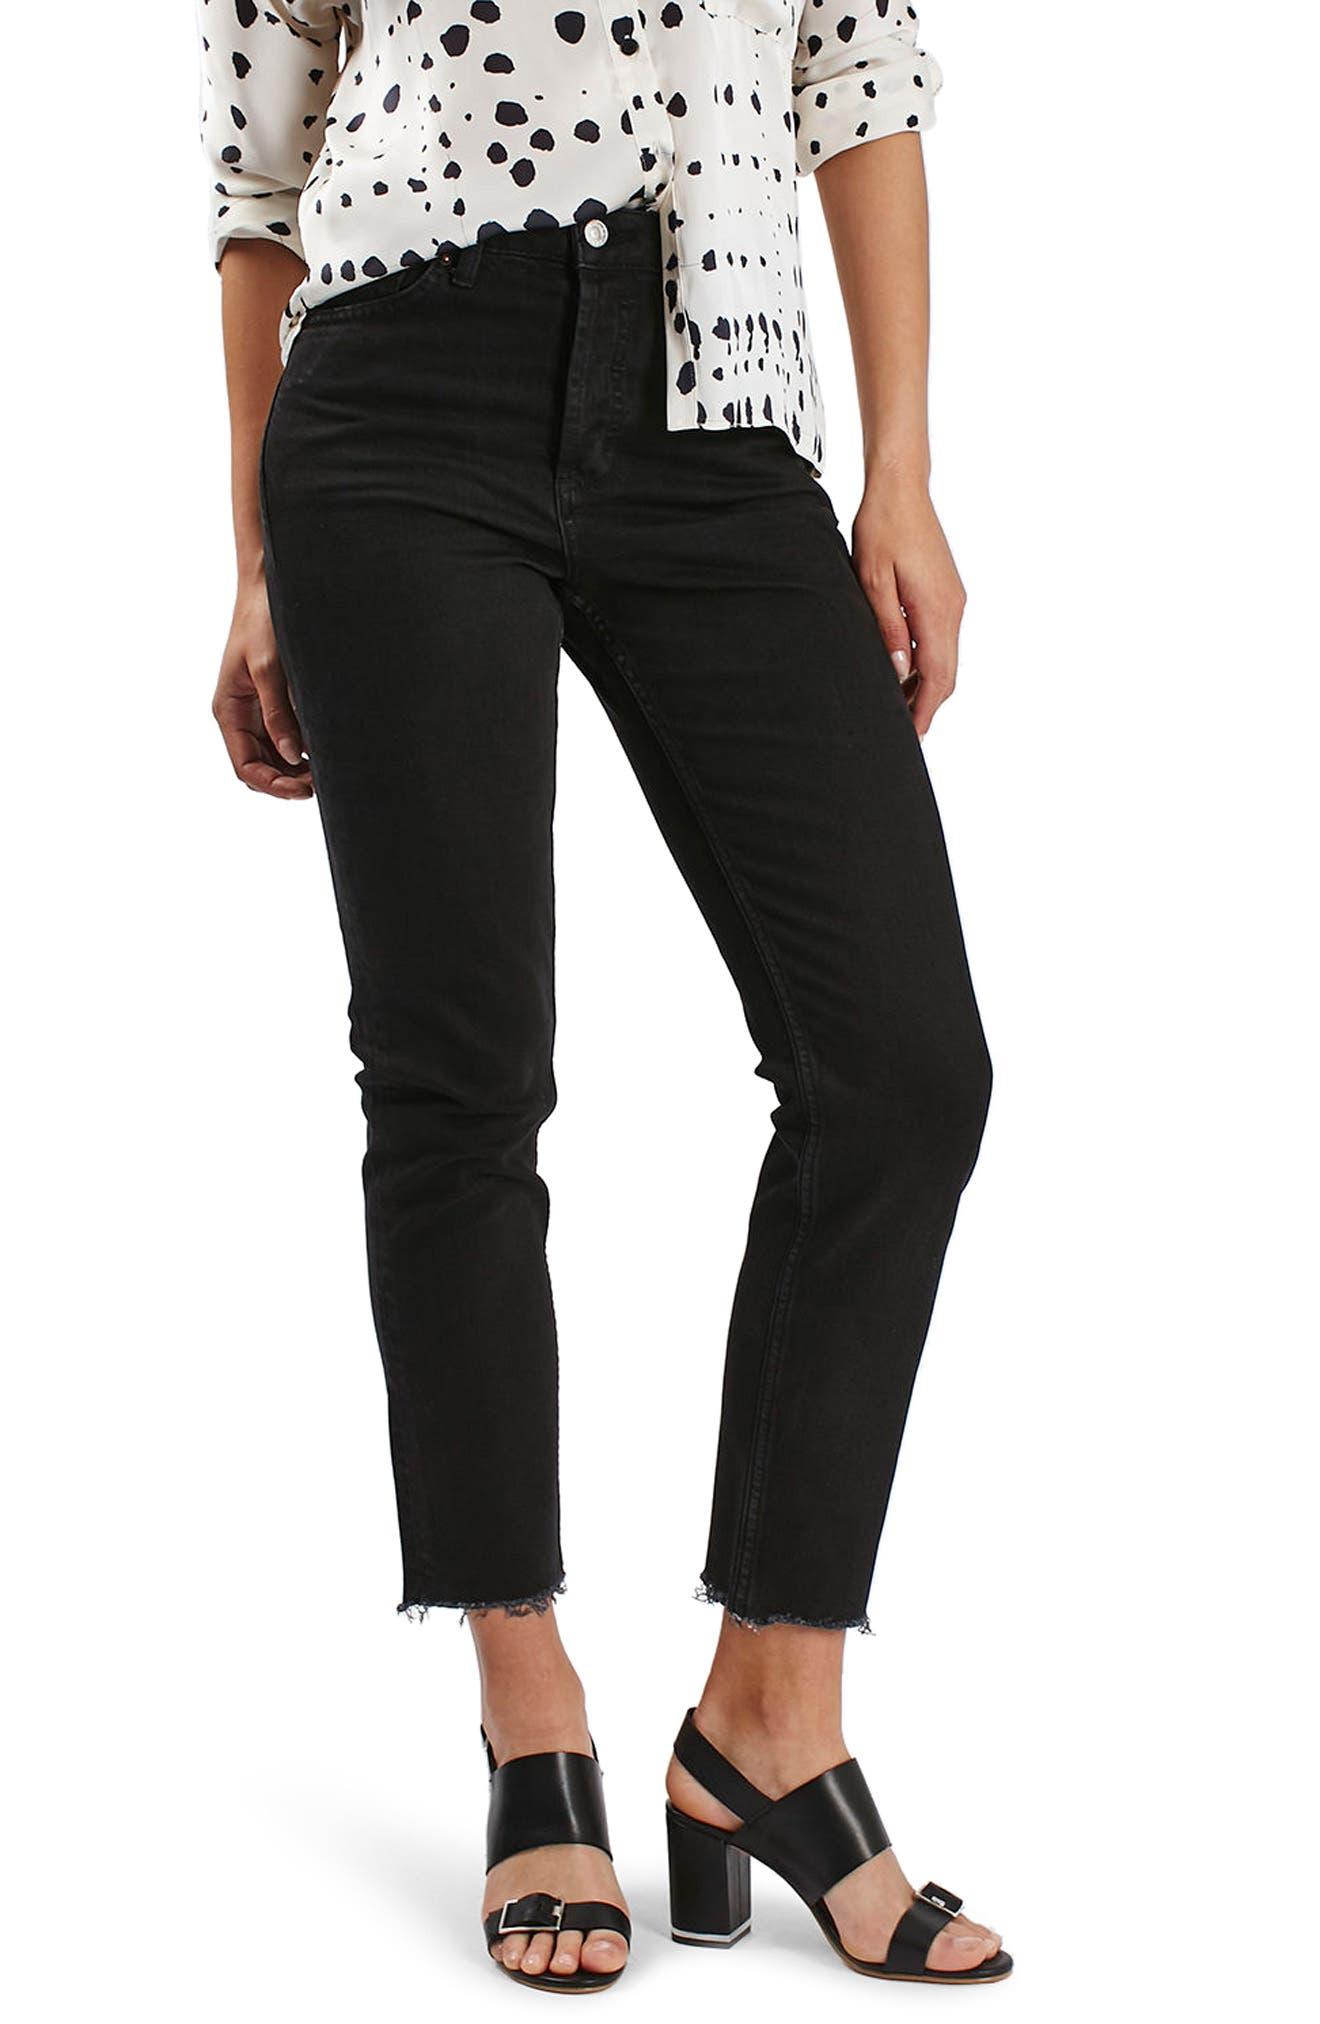 TOPSHOP, Raw Hem Straight Leg Jeans, Main thumbnail 1, color, WASHED BLACK